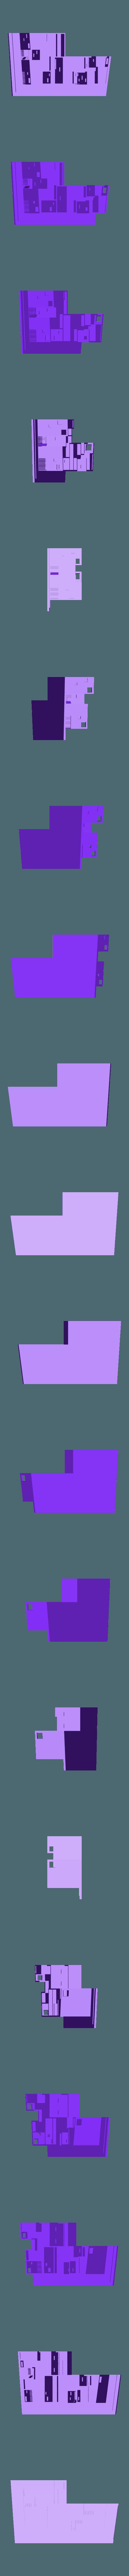 Model_1_200.stl Download free STL file 2 VIVIENDAS ADOSADAS • 3D printer template, chocarrat